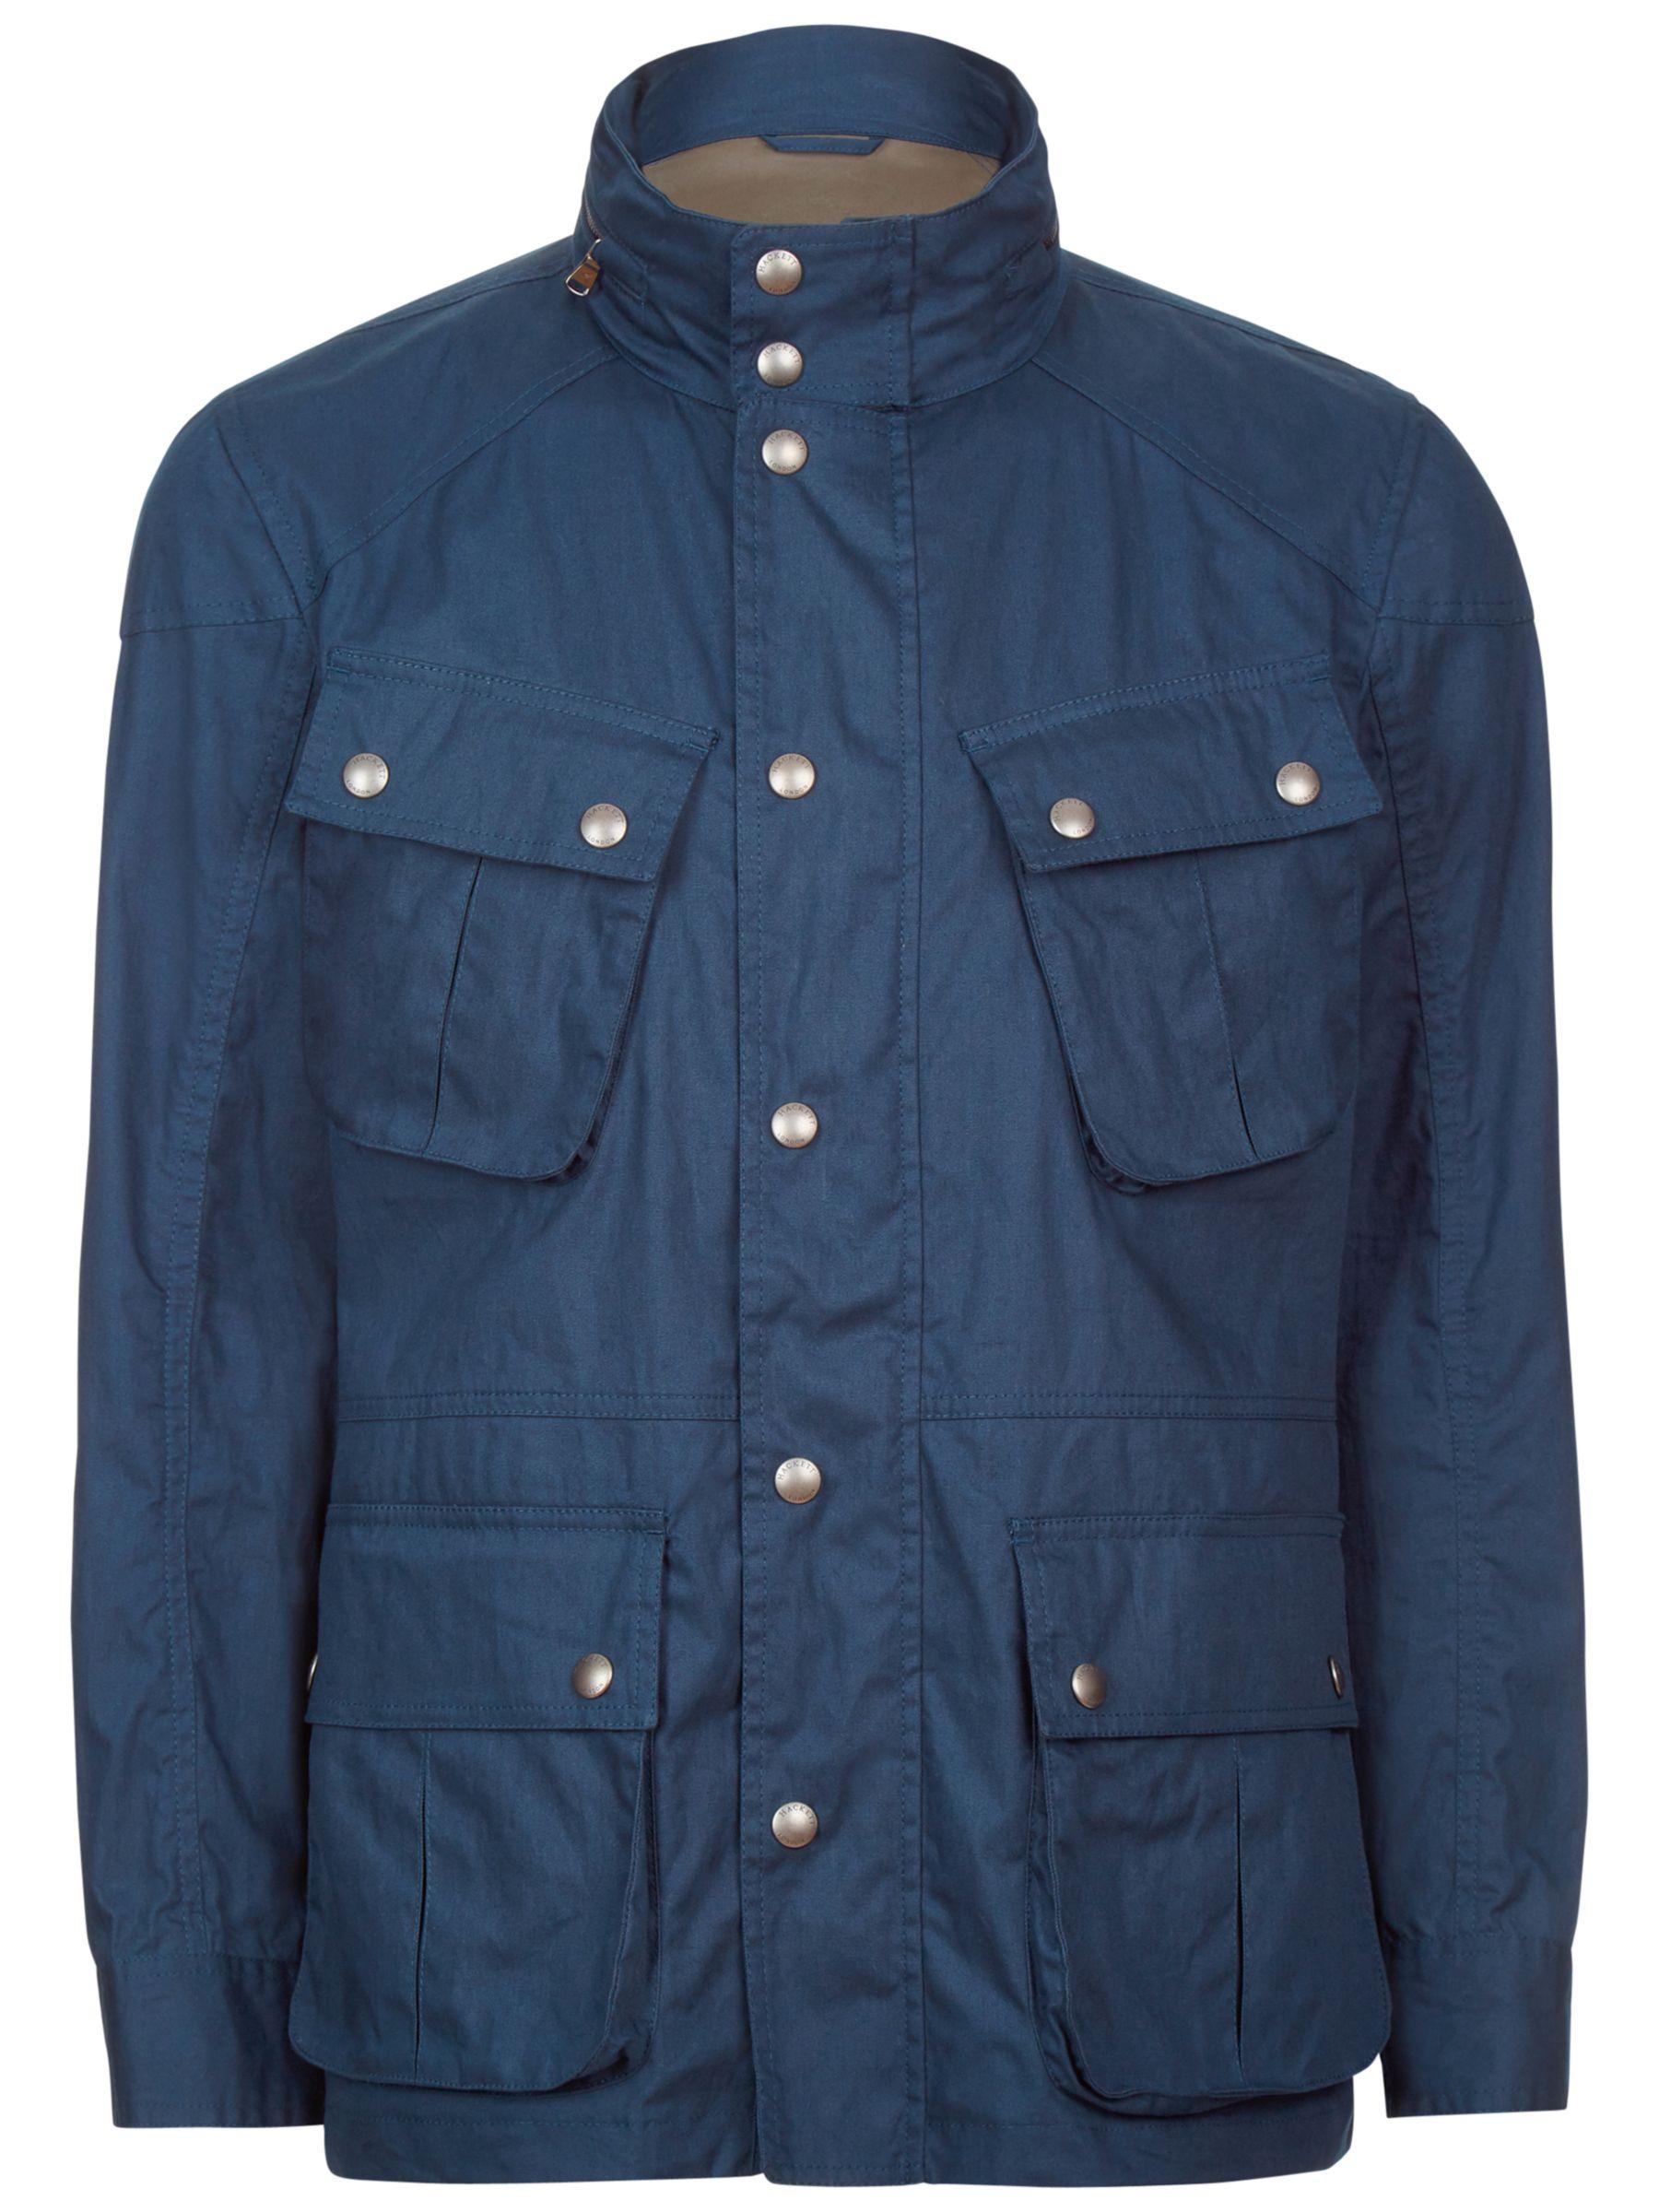 Hackett London Hackett London Velospeed Water-Repellent Cotton Coat, Navy